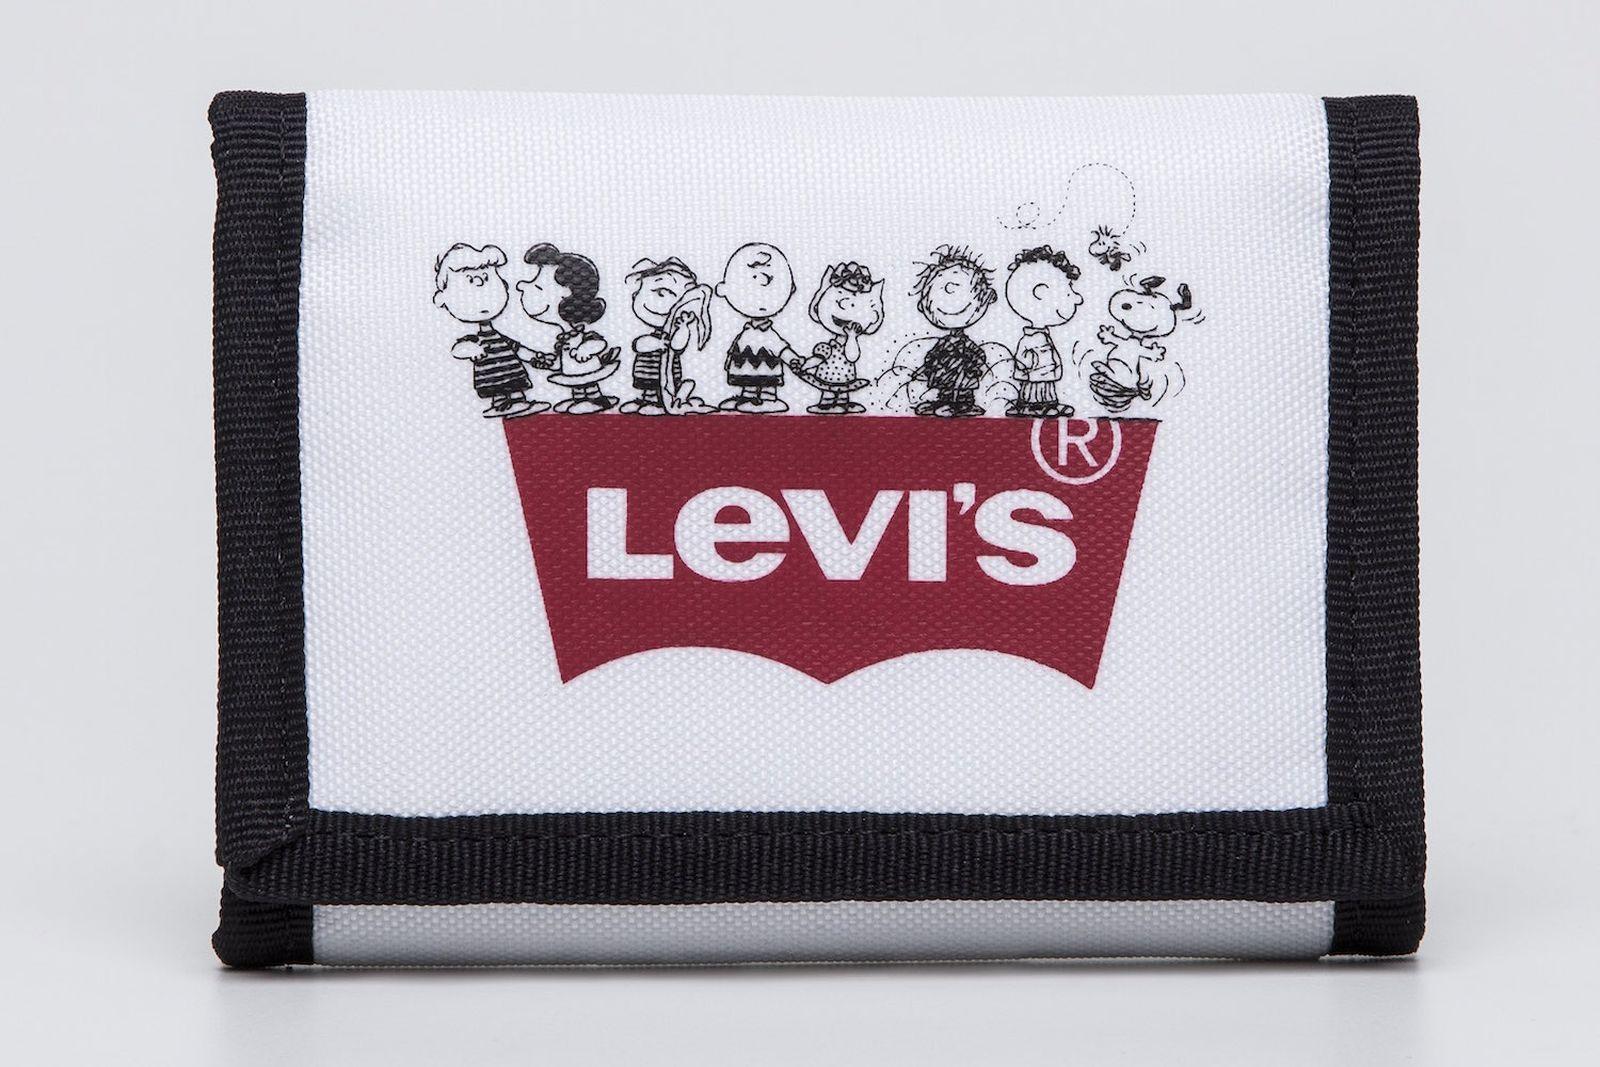 levis peanuts spring 2019 Levi's